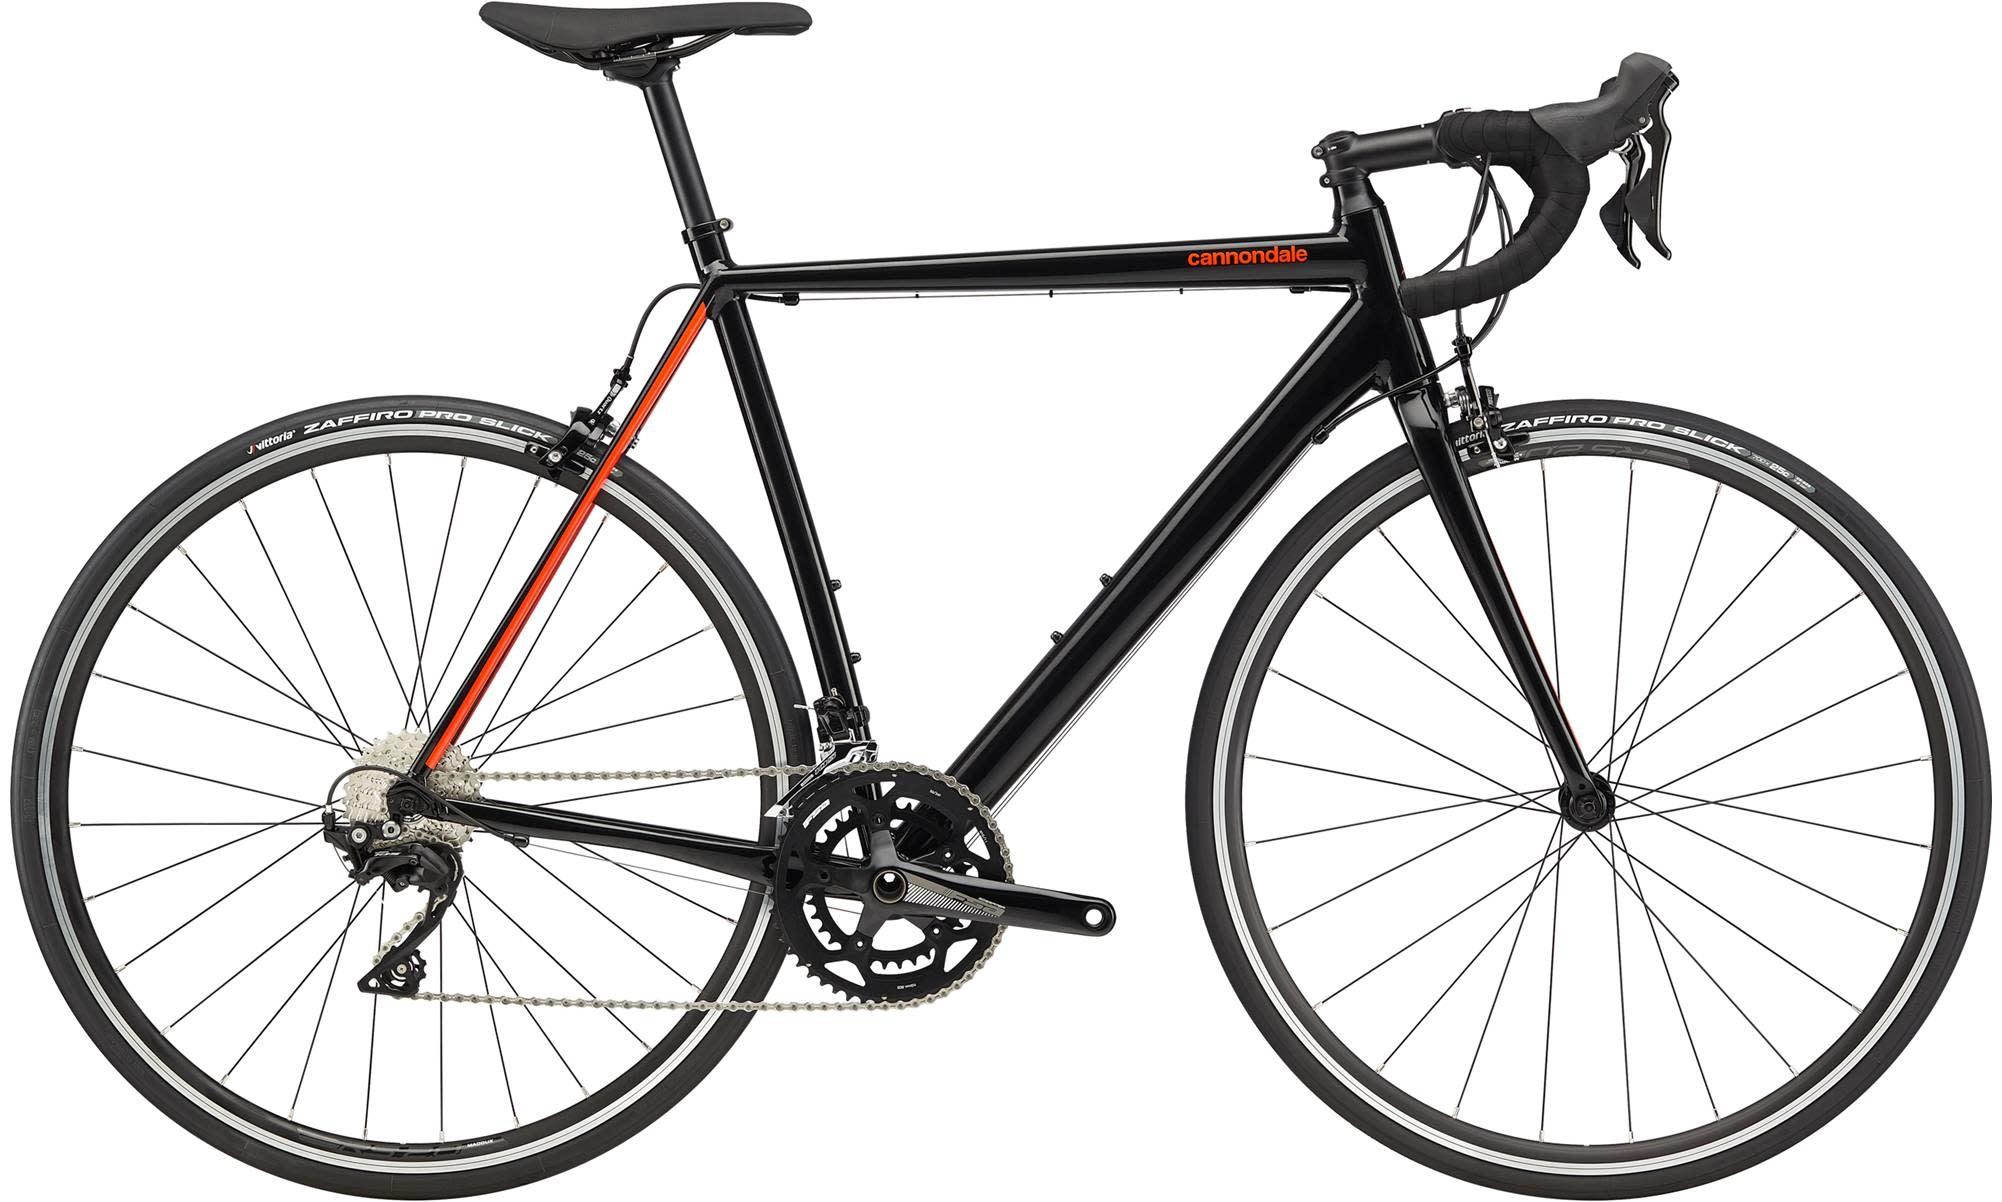 Cannondale Cannondale CAAD Optimo 105 Road Bike 2020